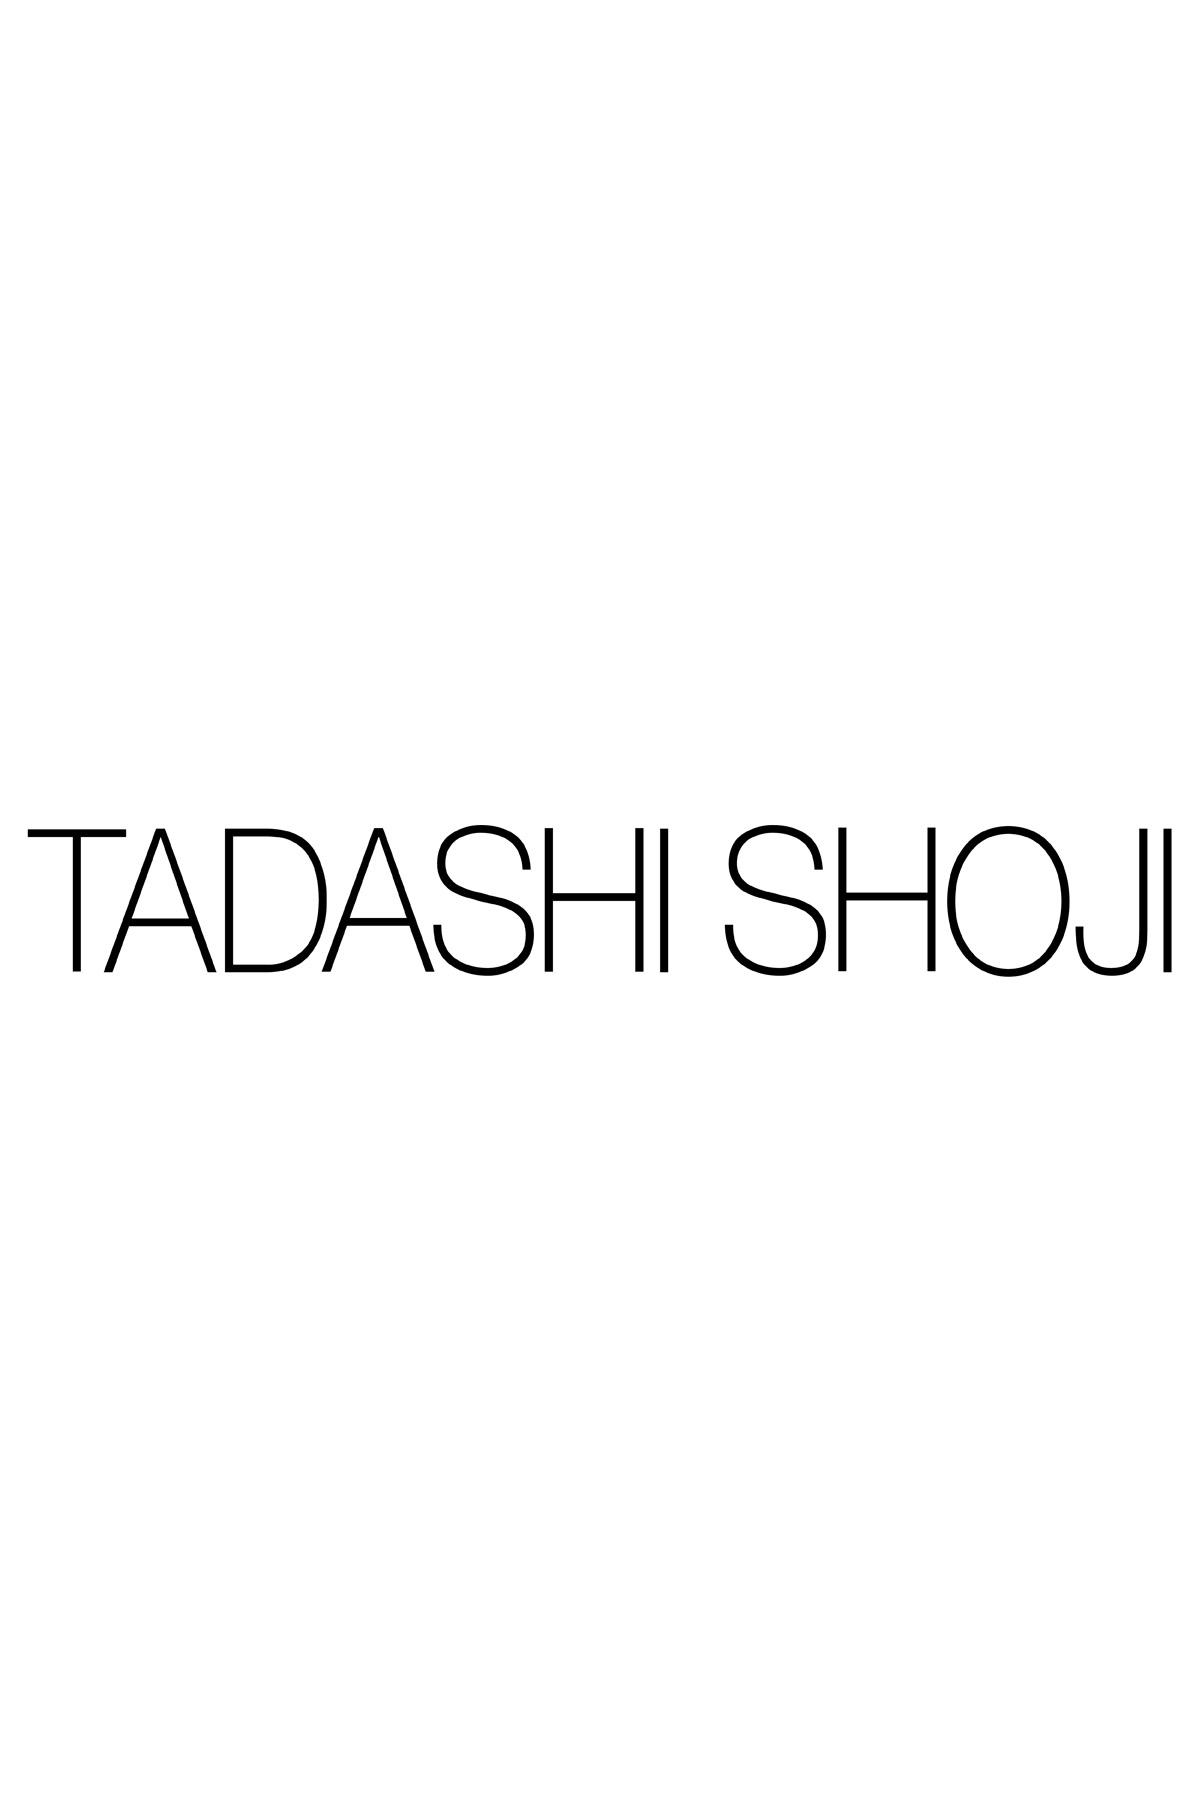 Tadashi Shoji - Paillette Embroidered Lace Cap Sleeve Dress - Detail